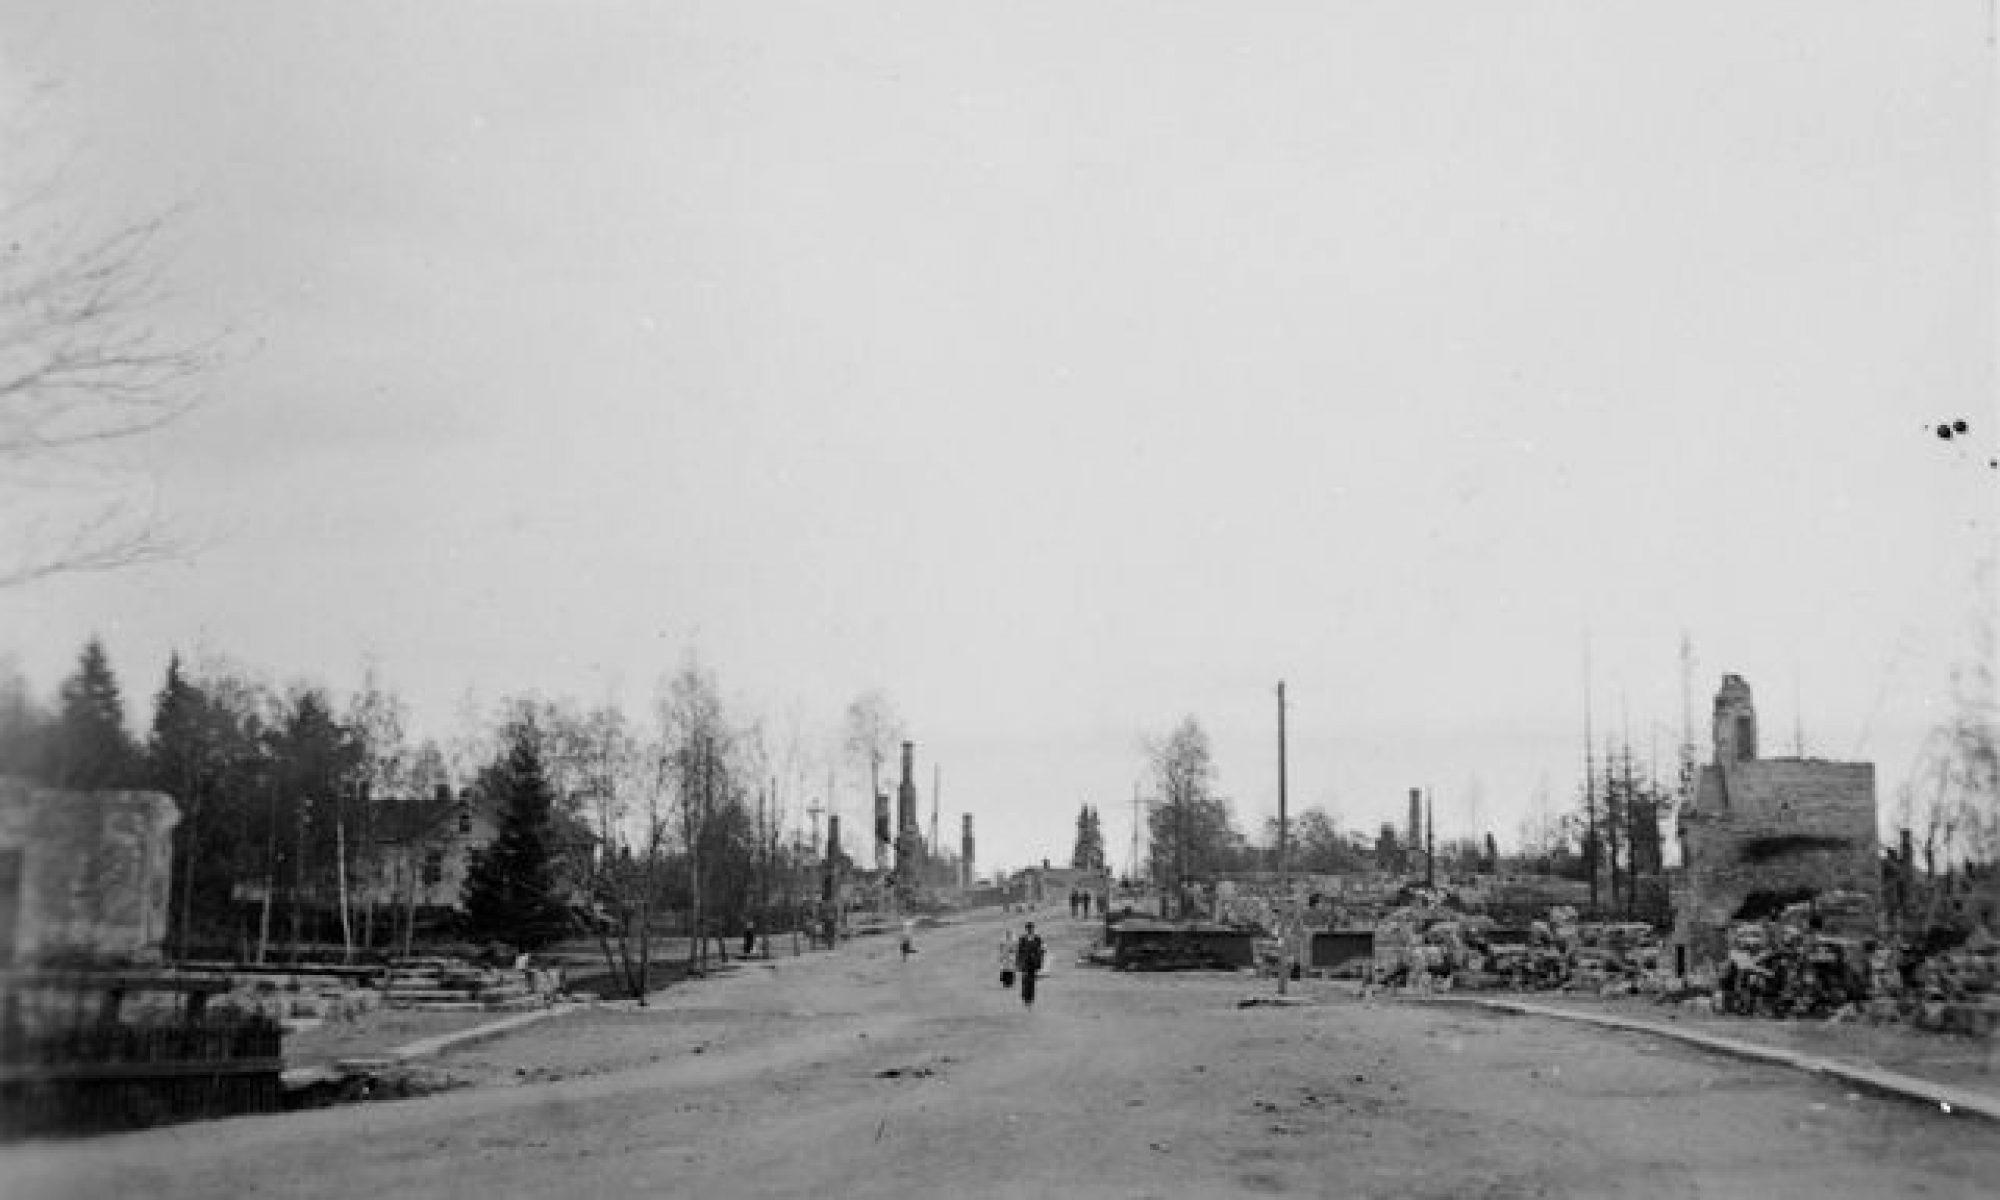 Vuoden 1918 pitkäaikaisvaikutukset -tutkimushanke